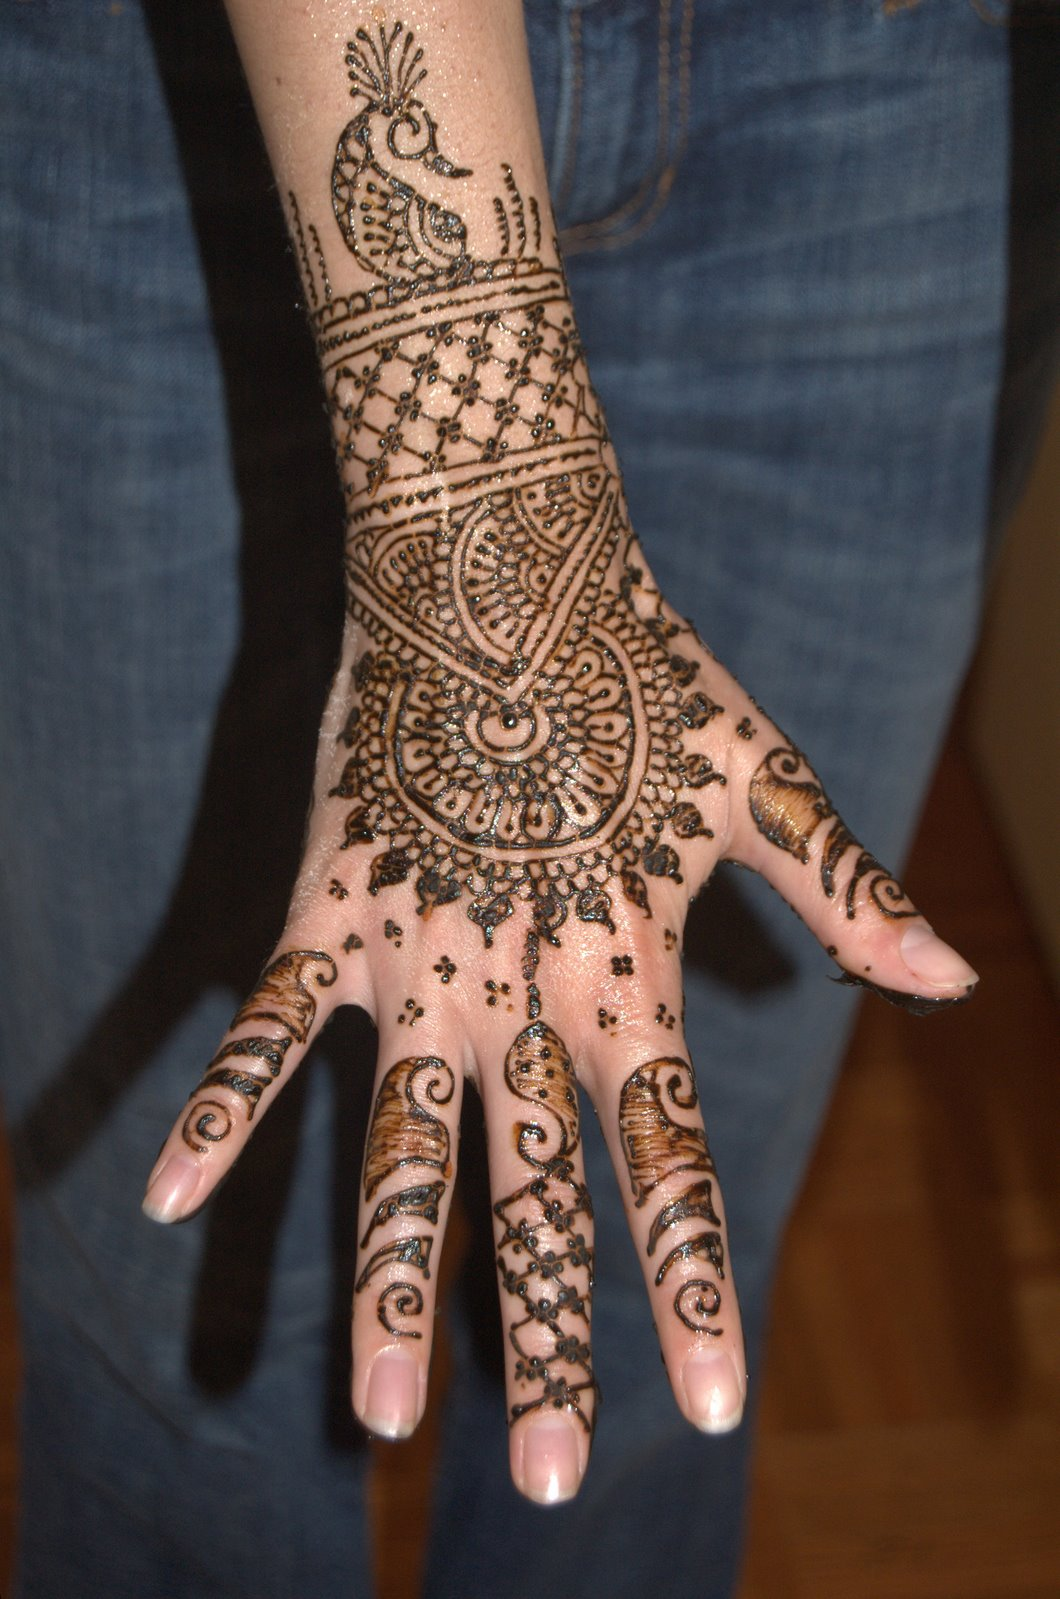 Mehndi On Hands Design : Information technology hand mehndi designs